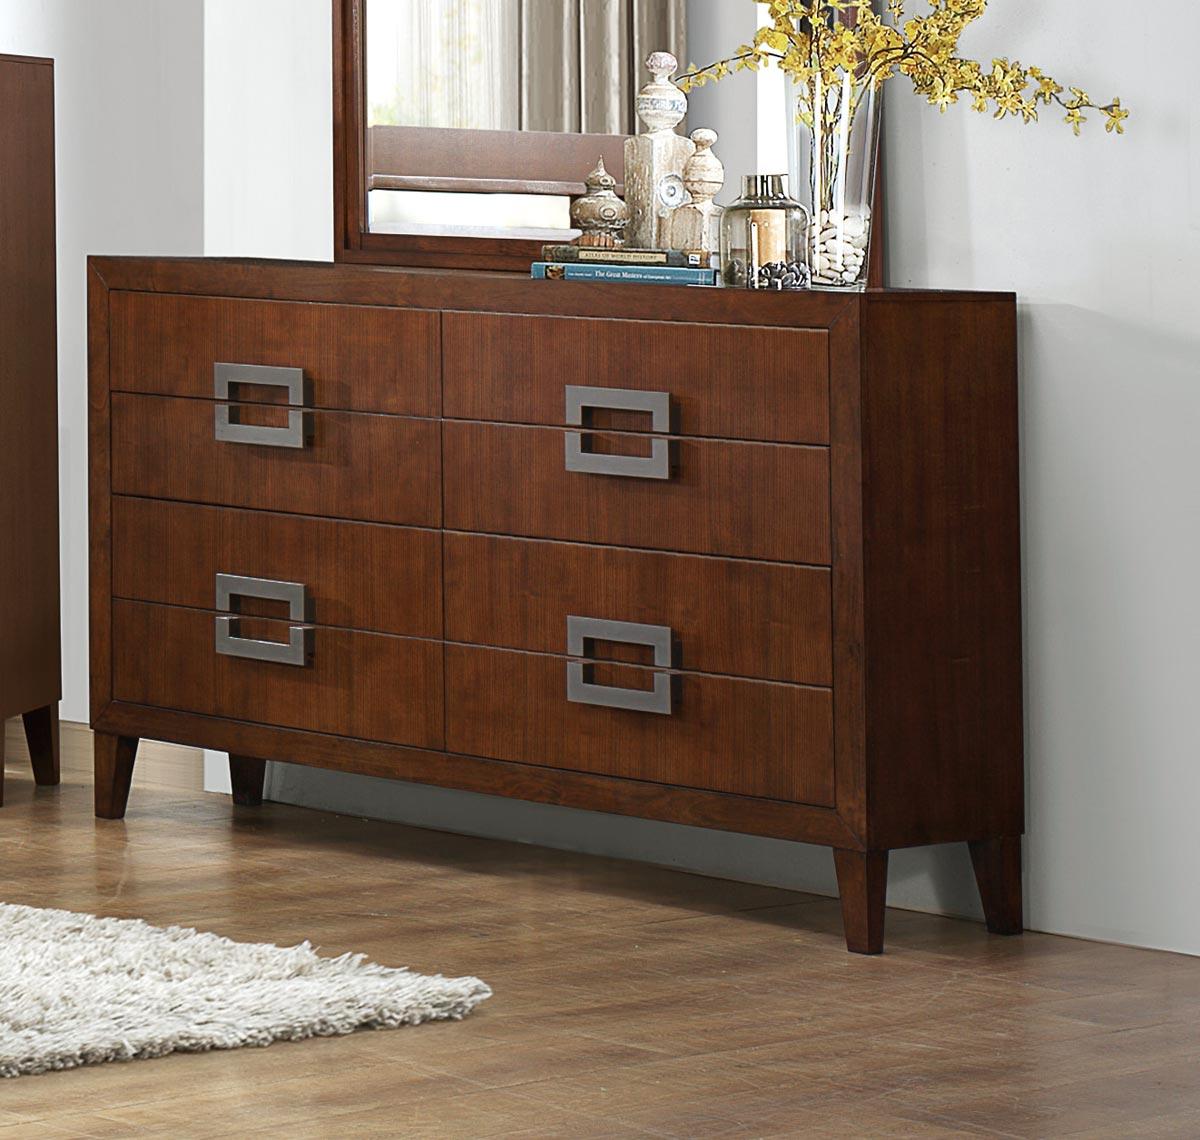 Homelegance Arata Dresser - Cappucino Brown